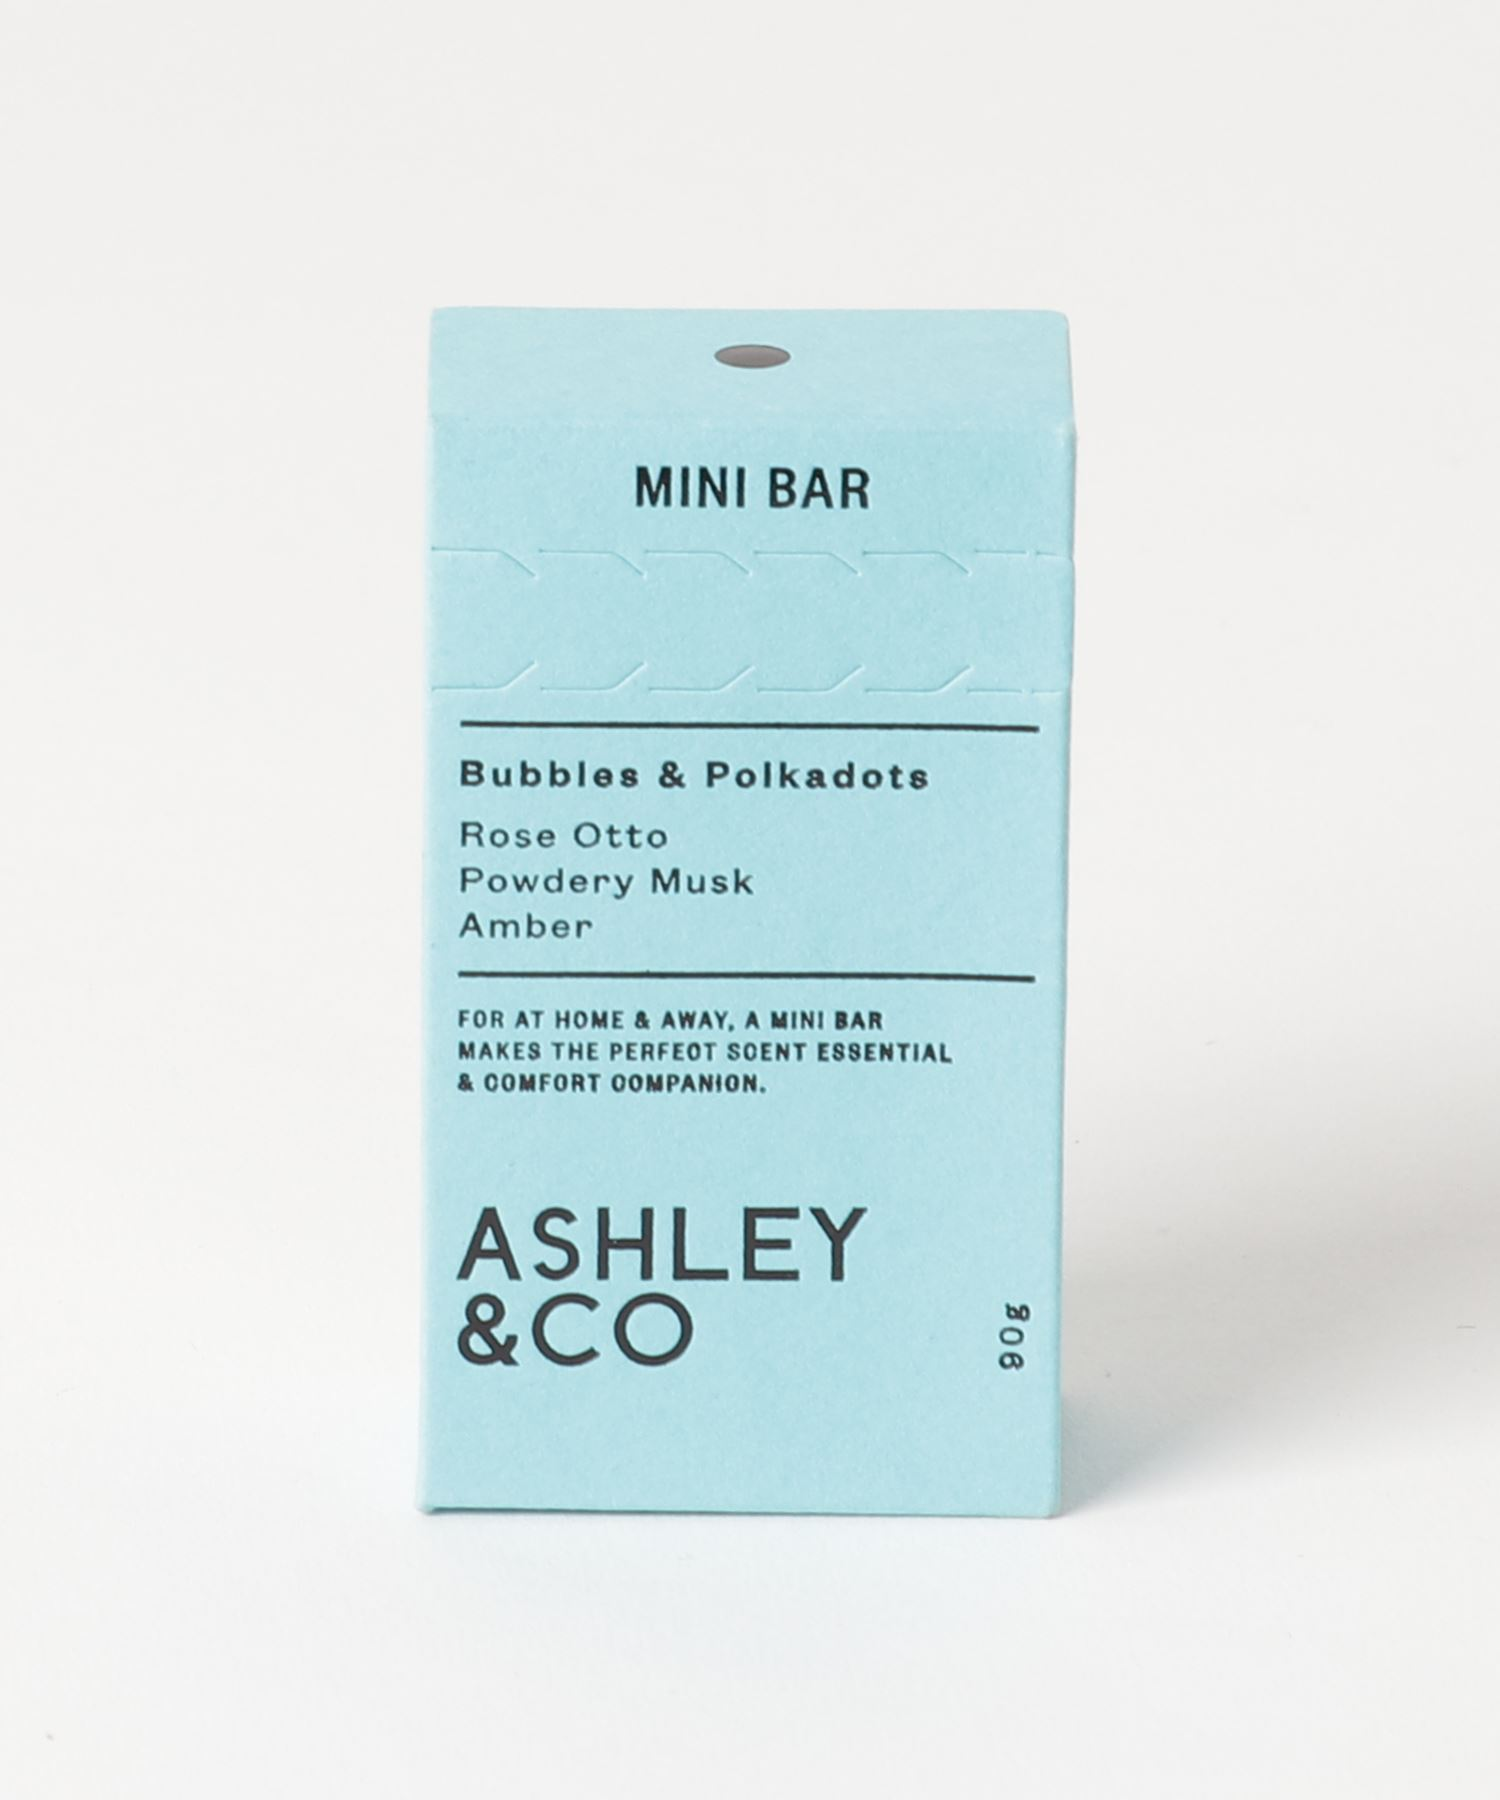 ASHLEY & CO ソープ Bubbles & Polkadots 90g